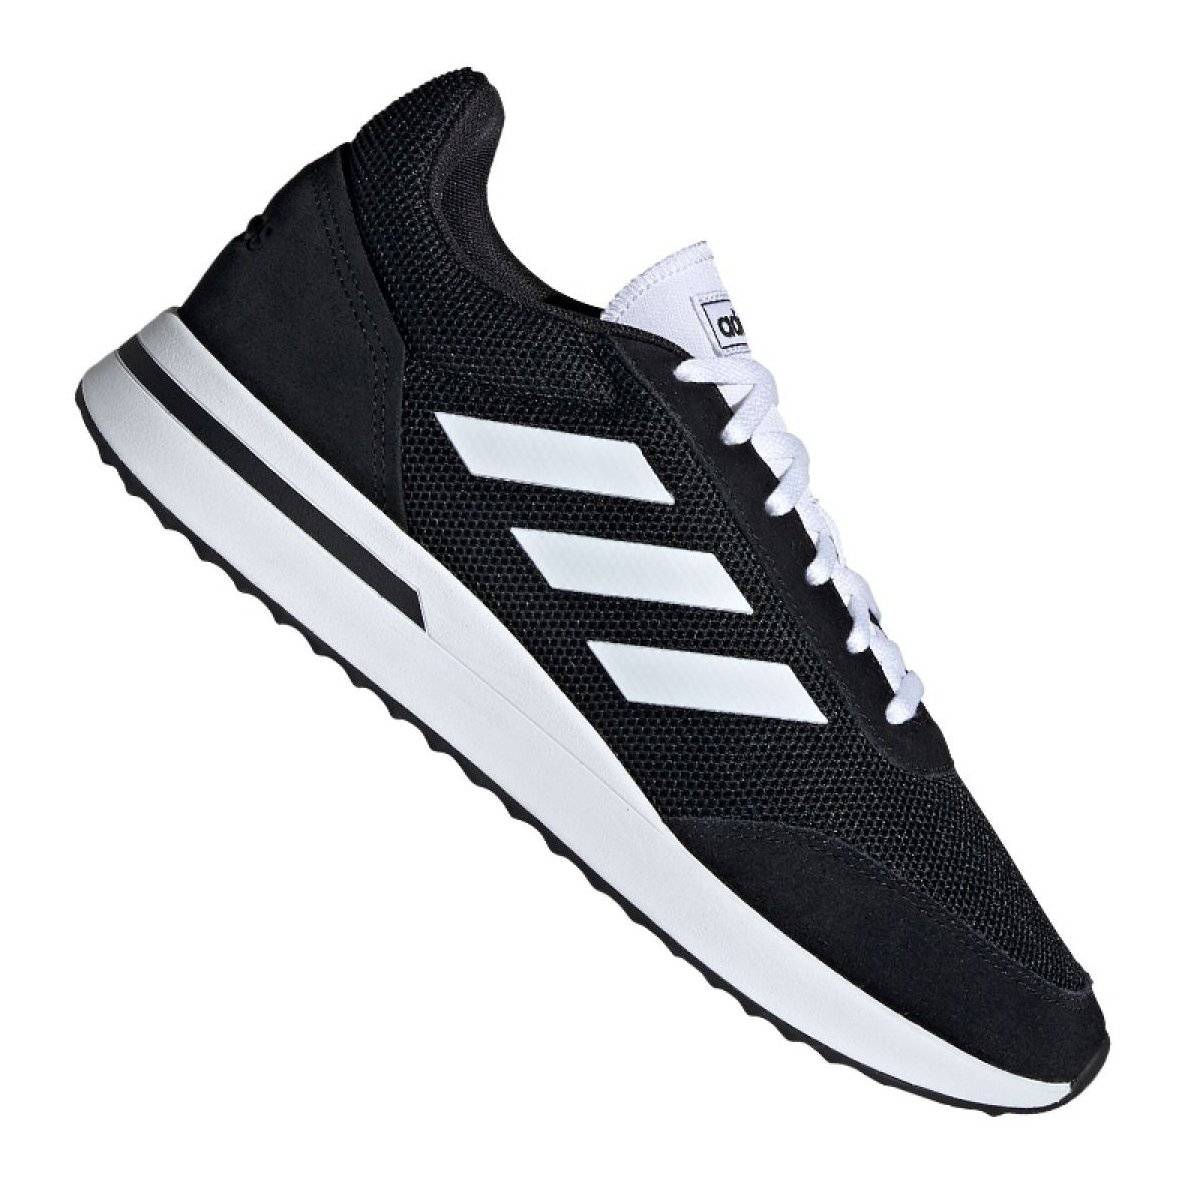 adidas Originals Swift Run Primeknit CQ2893 férfi sneakers